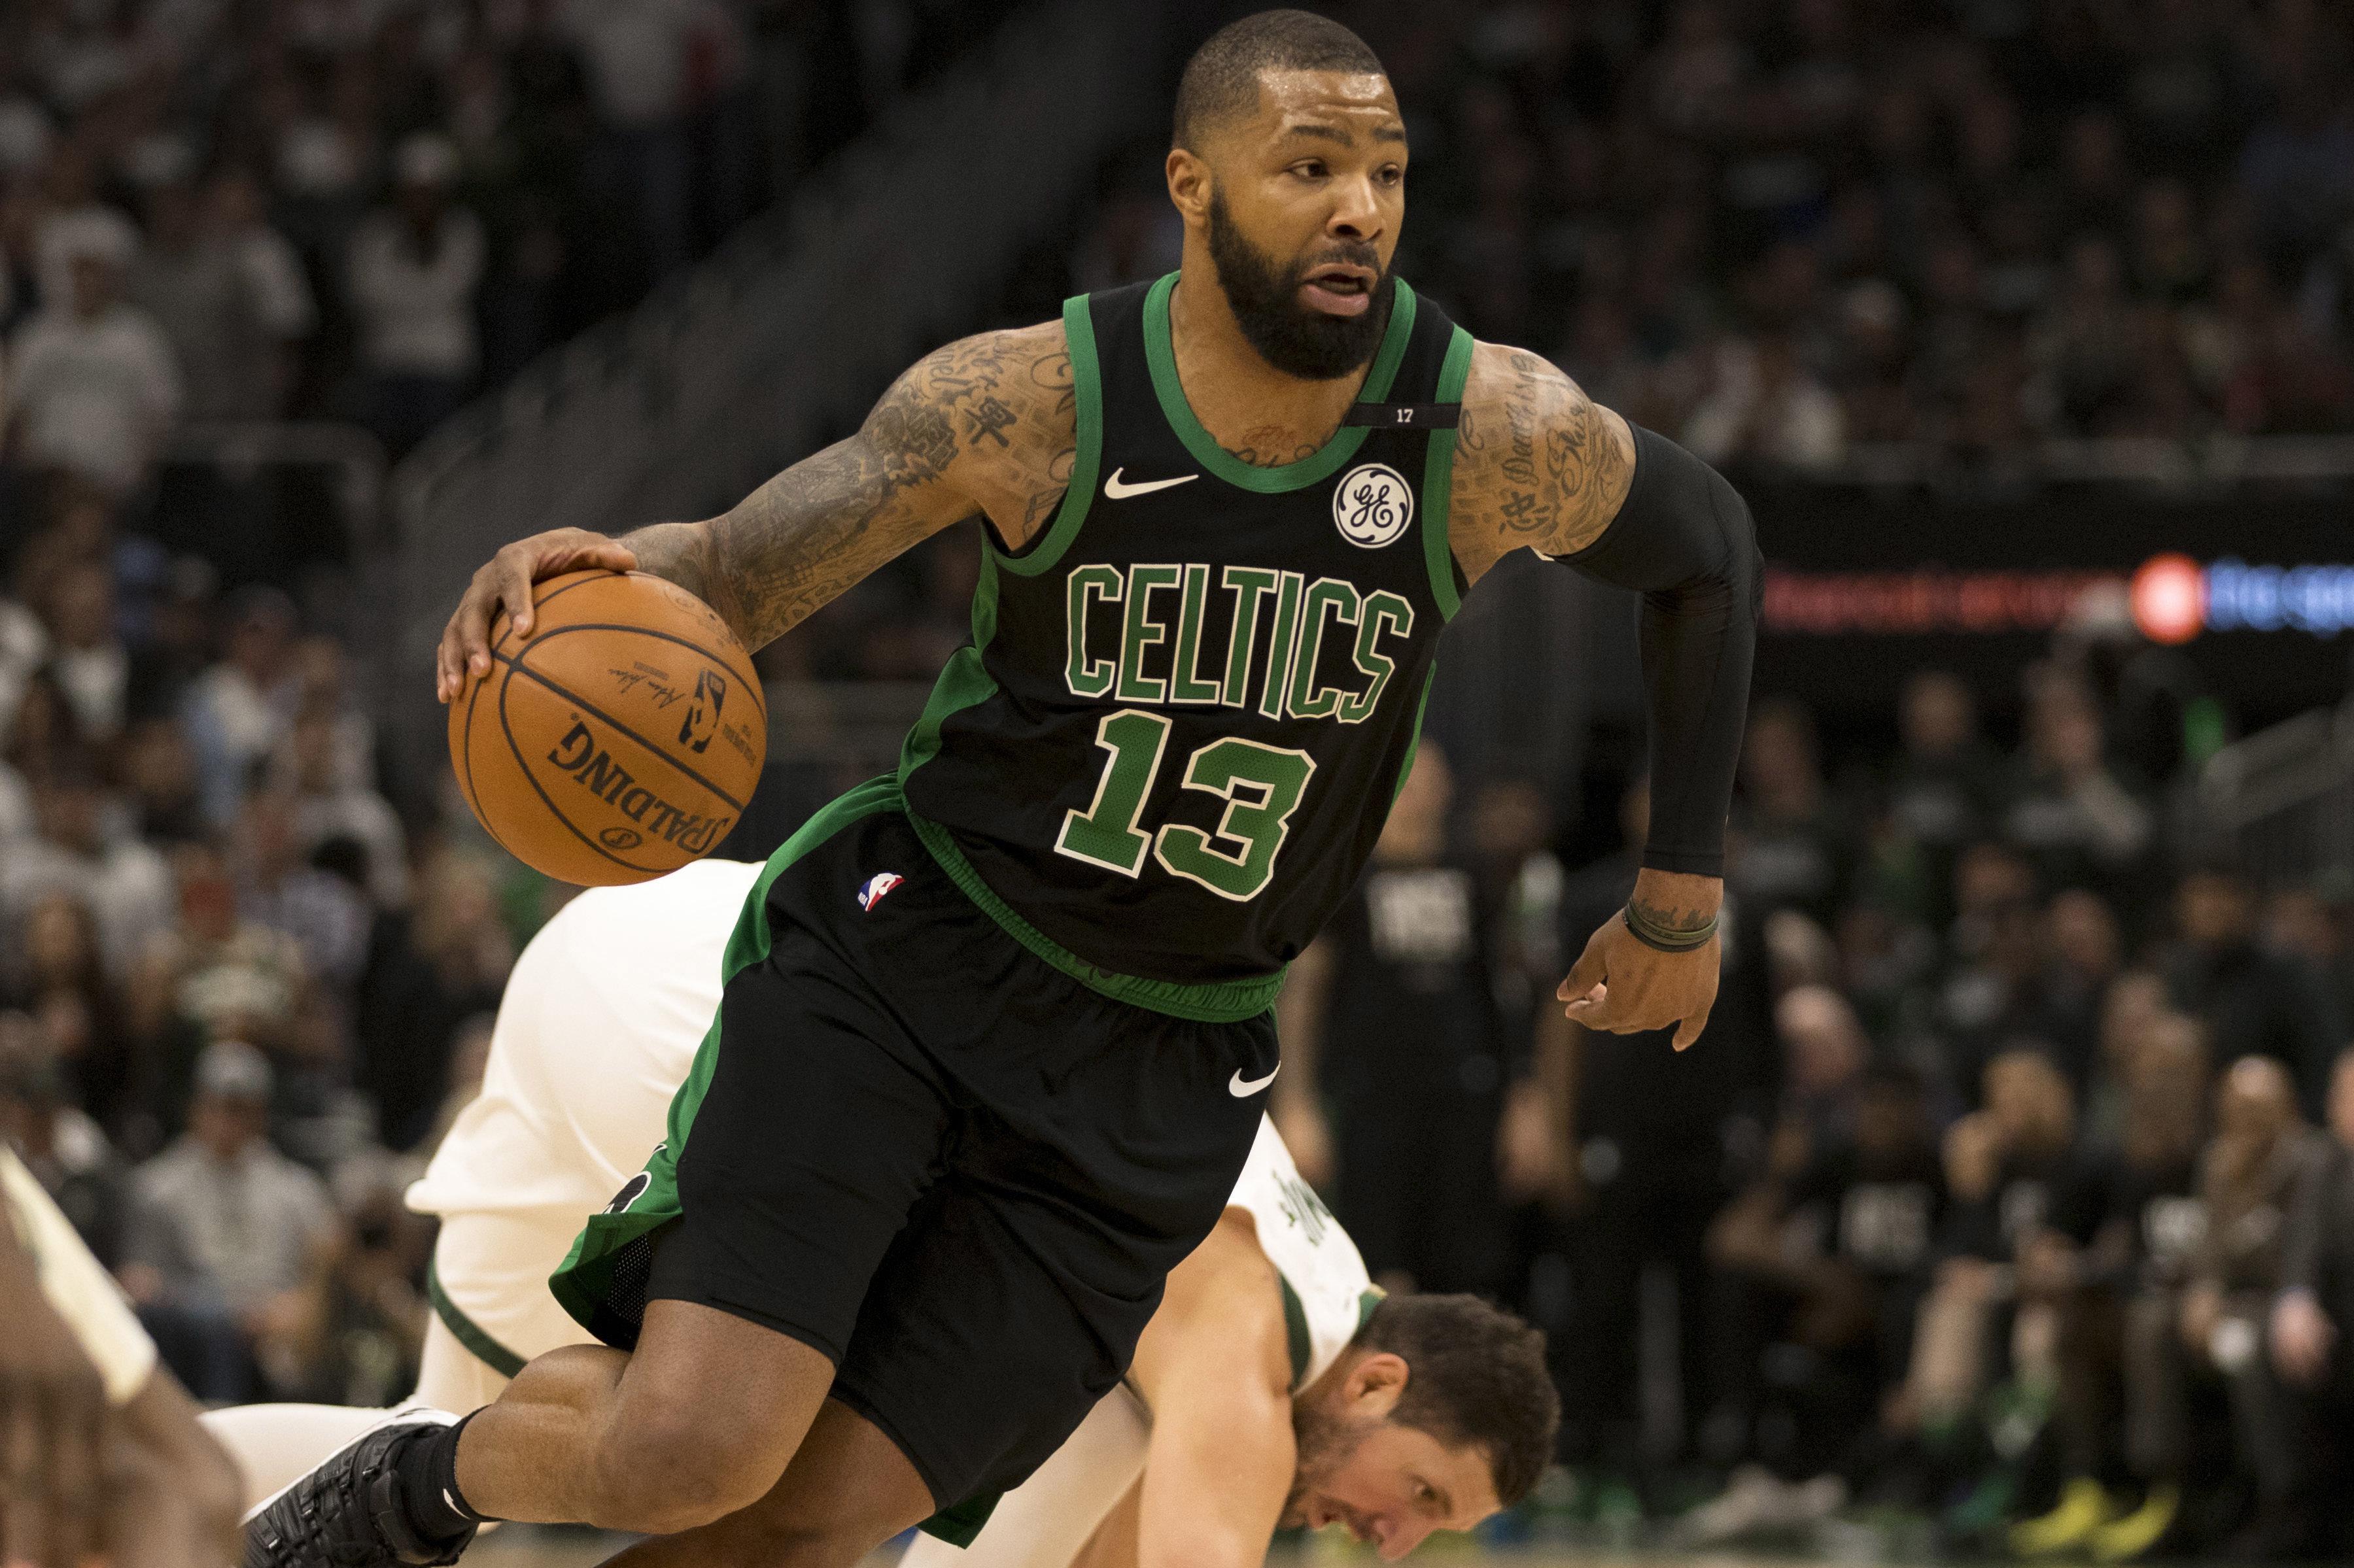 Carsen Edwards Tacko Fall Lead Celtics Past 76ers At 2019 Nba